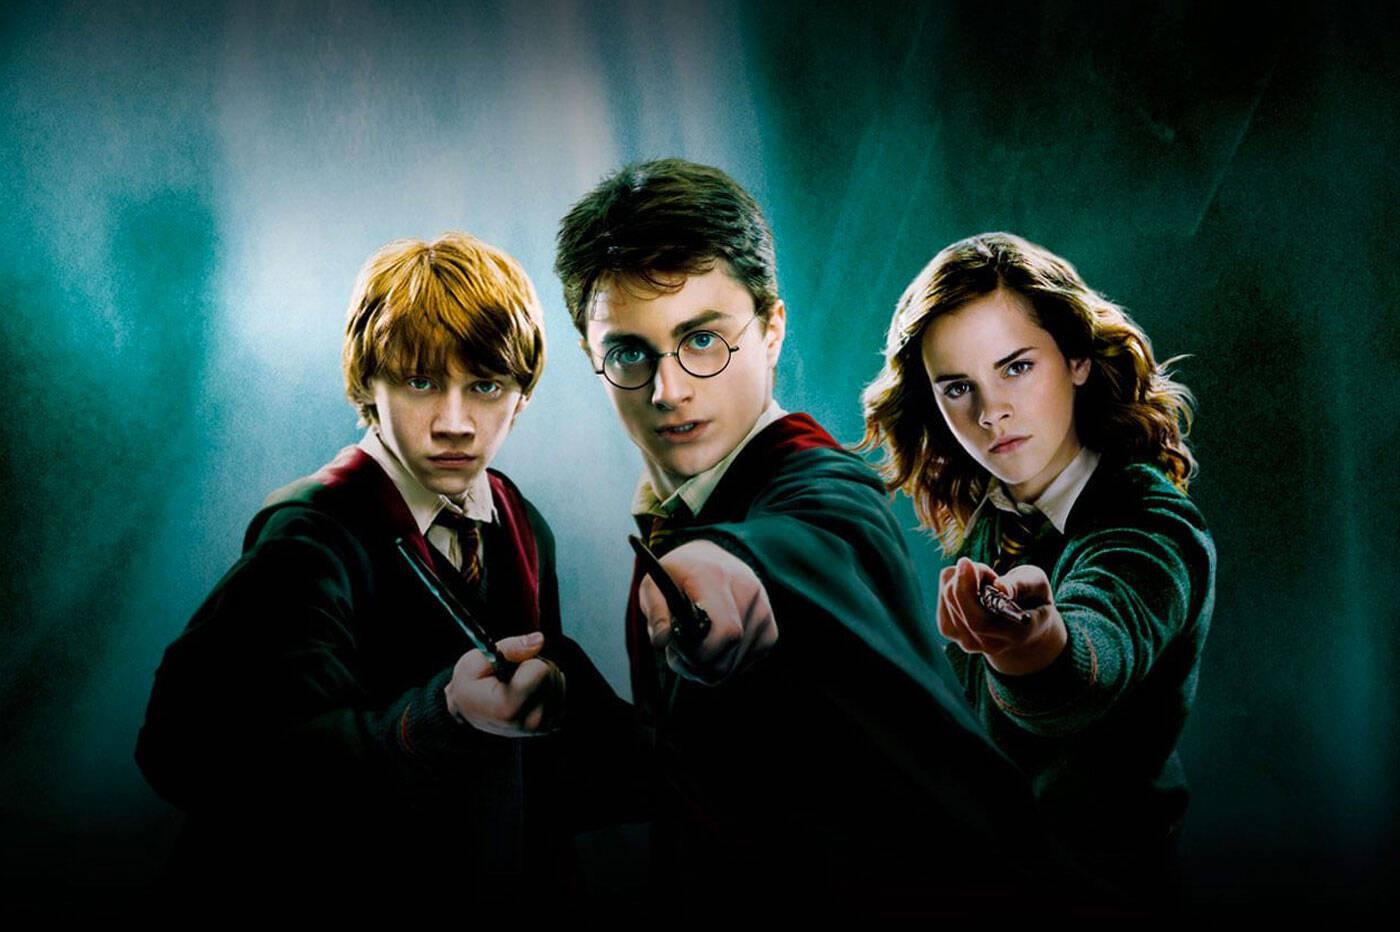 Es-tu un vrai fan d'Harry Potter ?